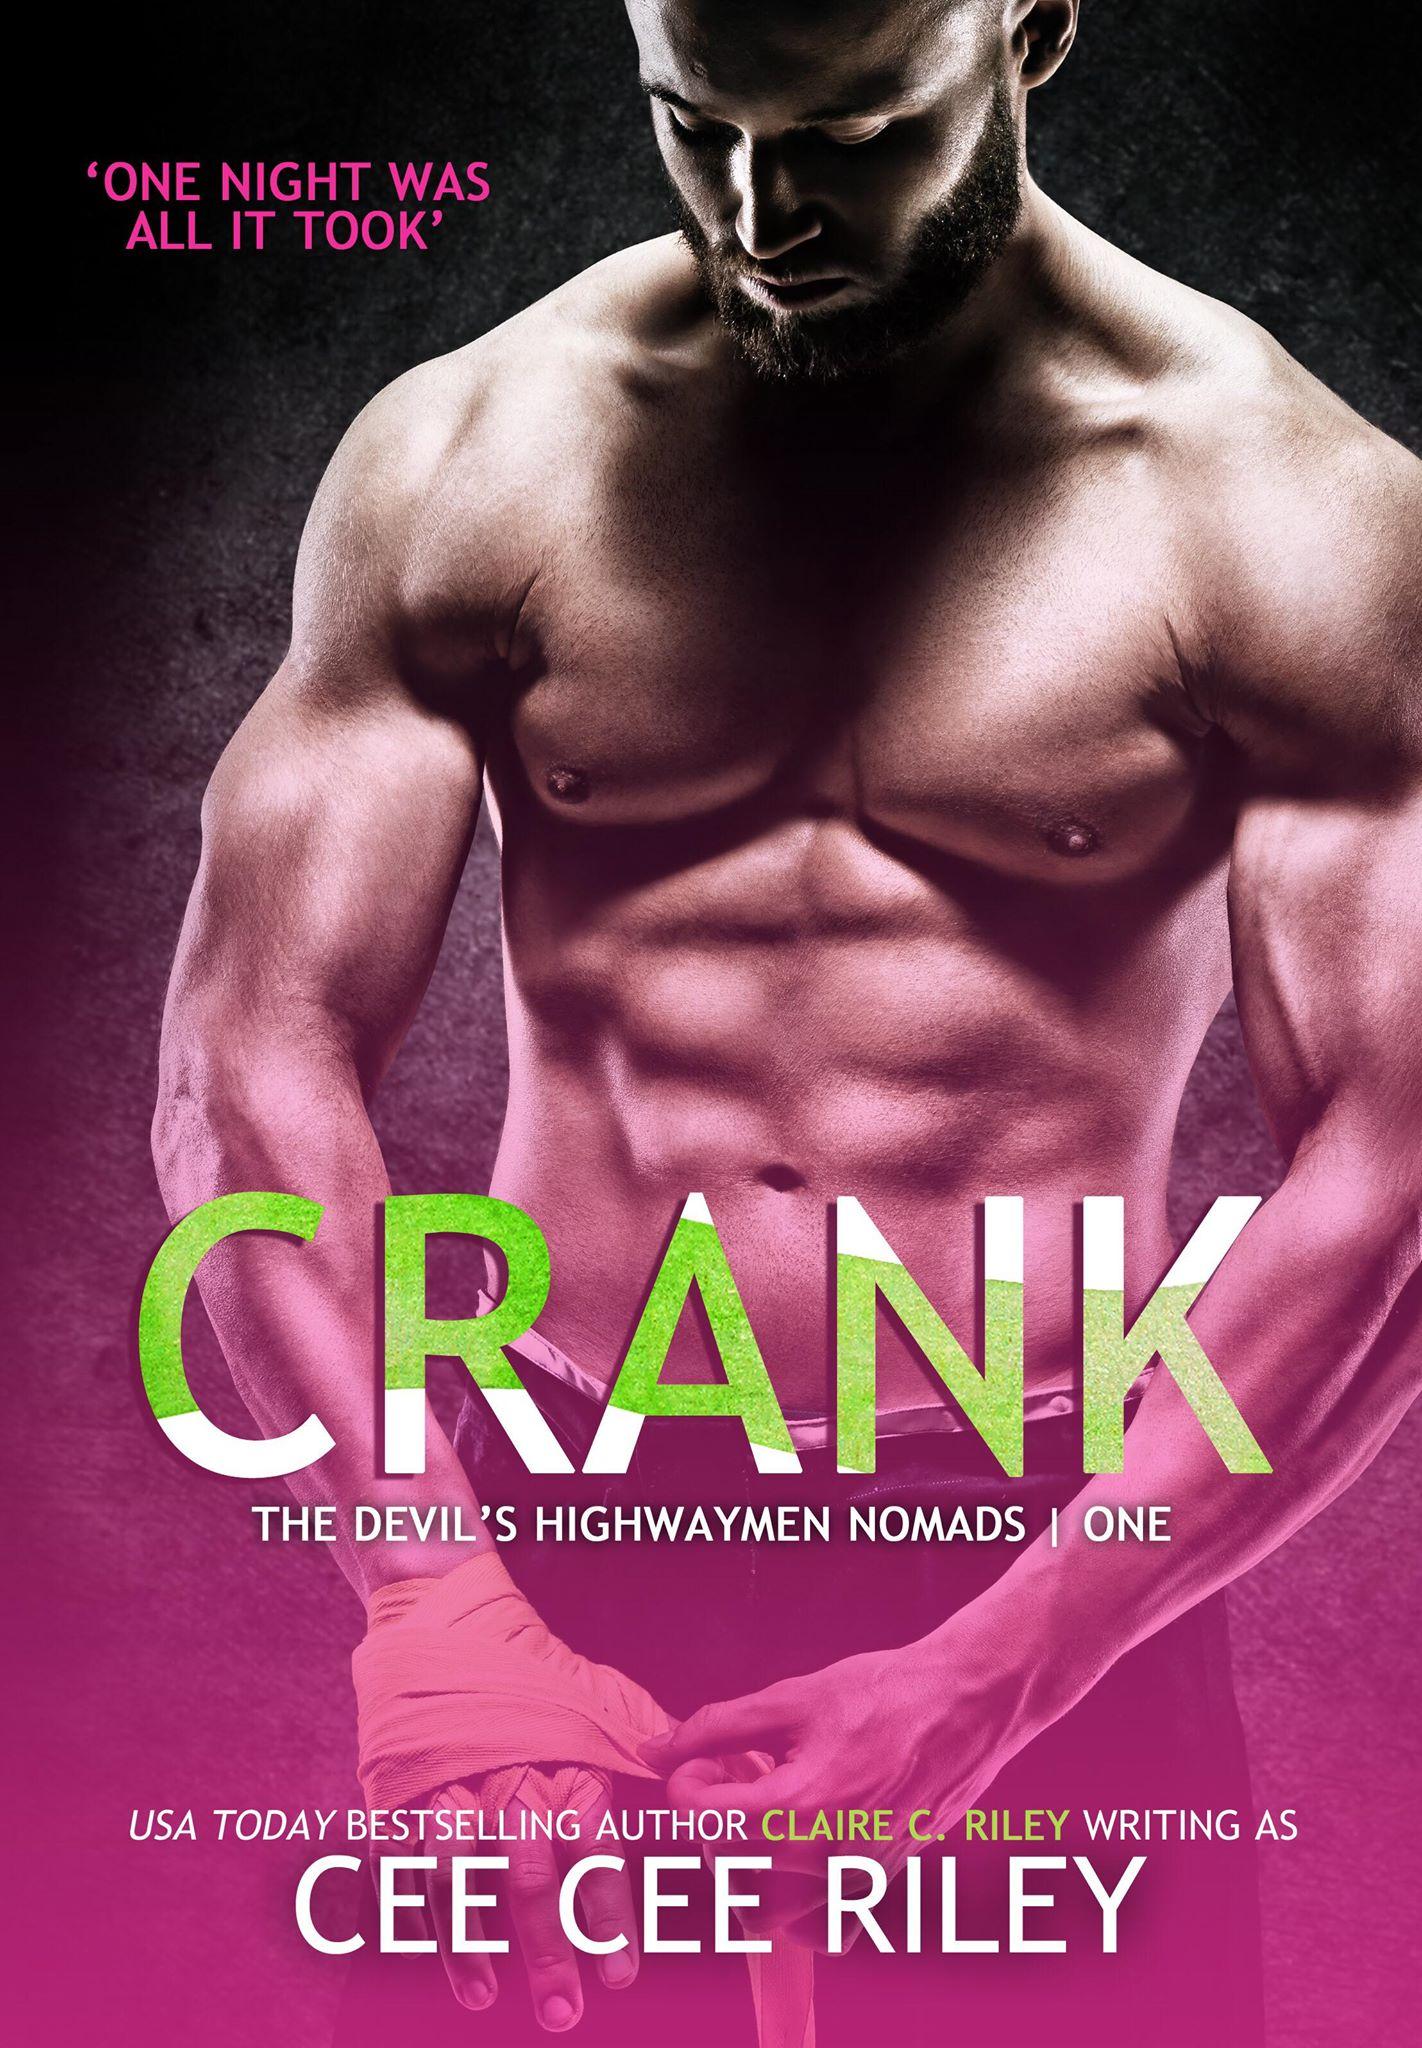 Crank ebook final